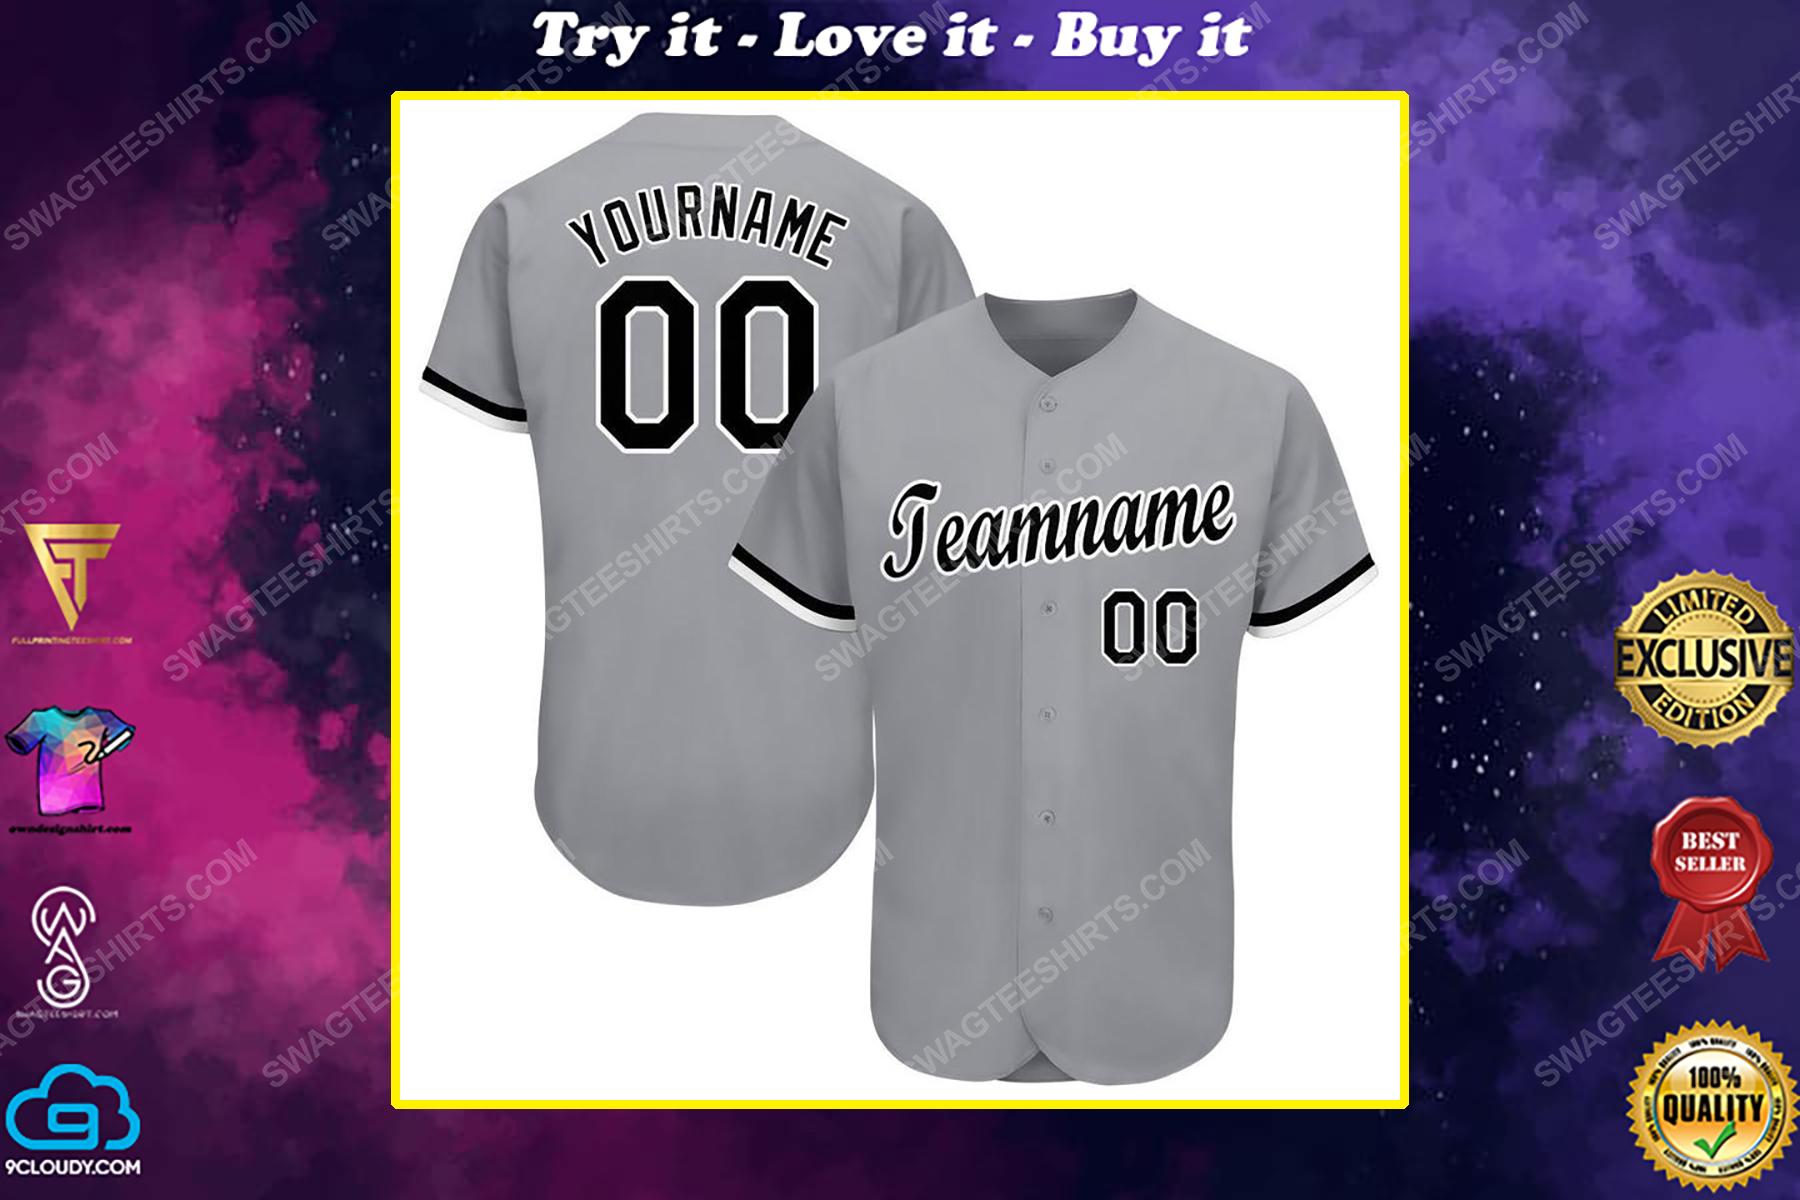 Custom team name chicago white sox major league baseball baseball jersey